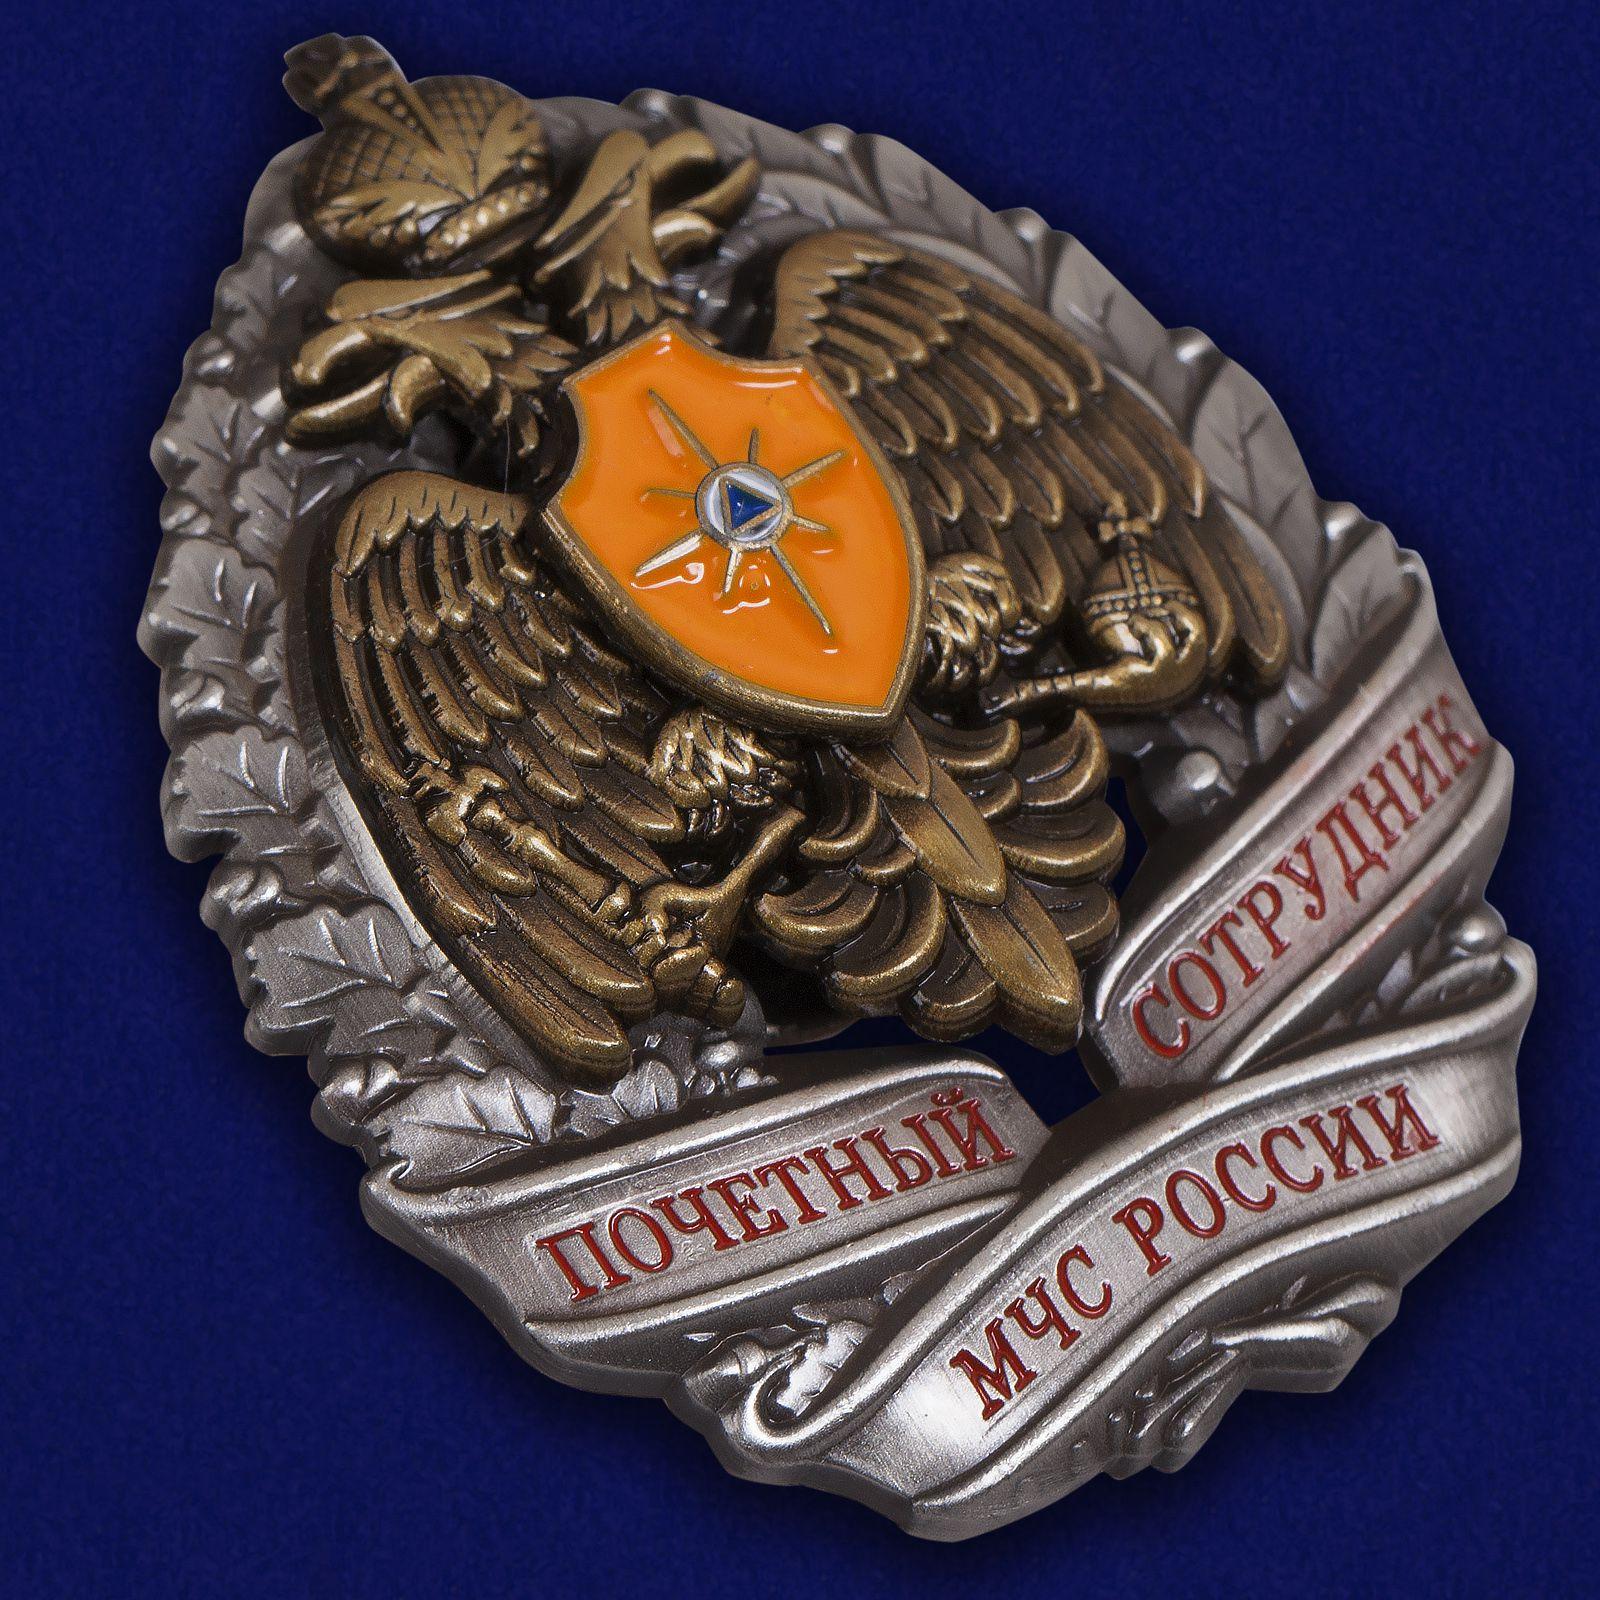 Знаки МЧС заказать в Военпро